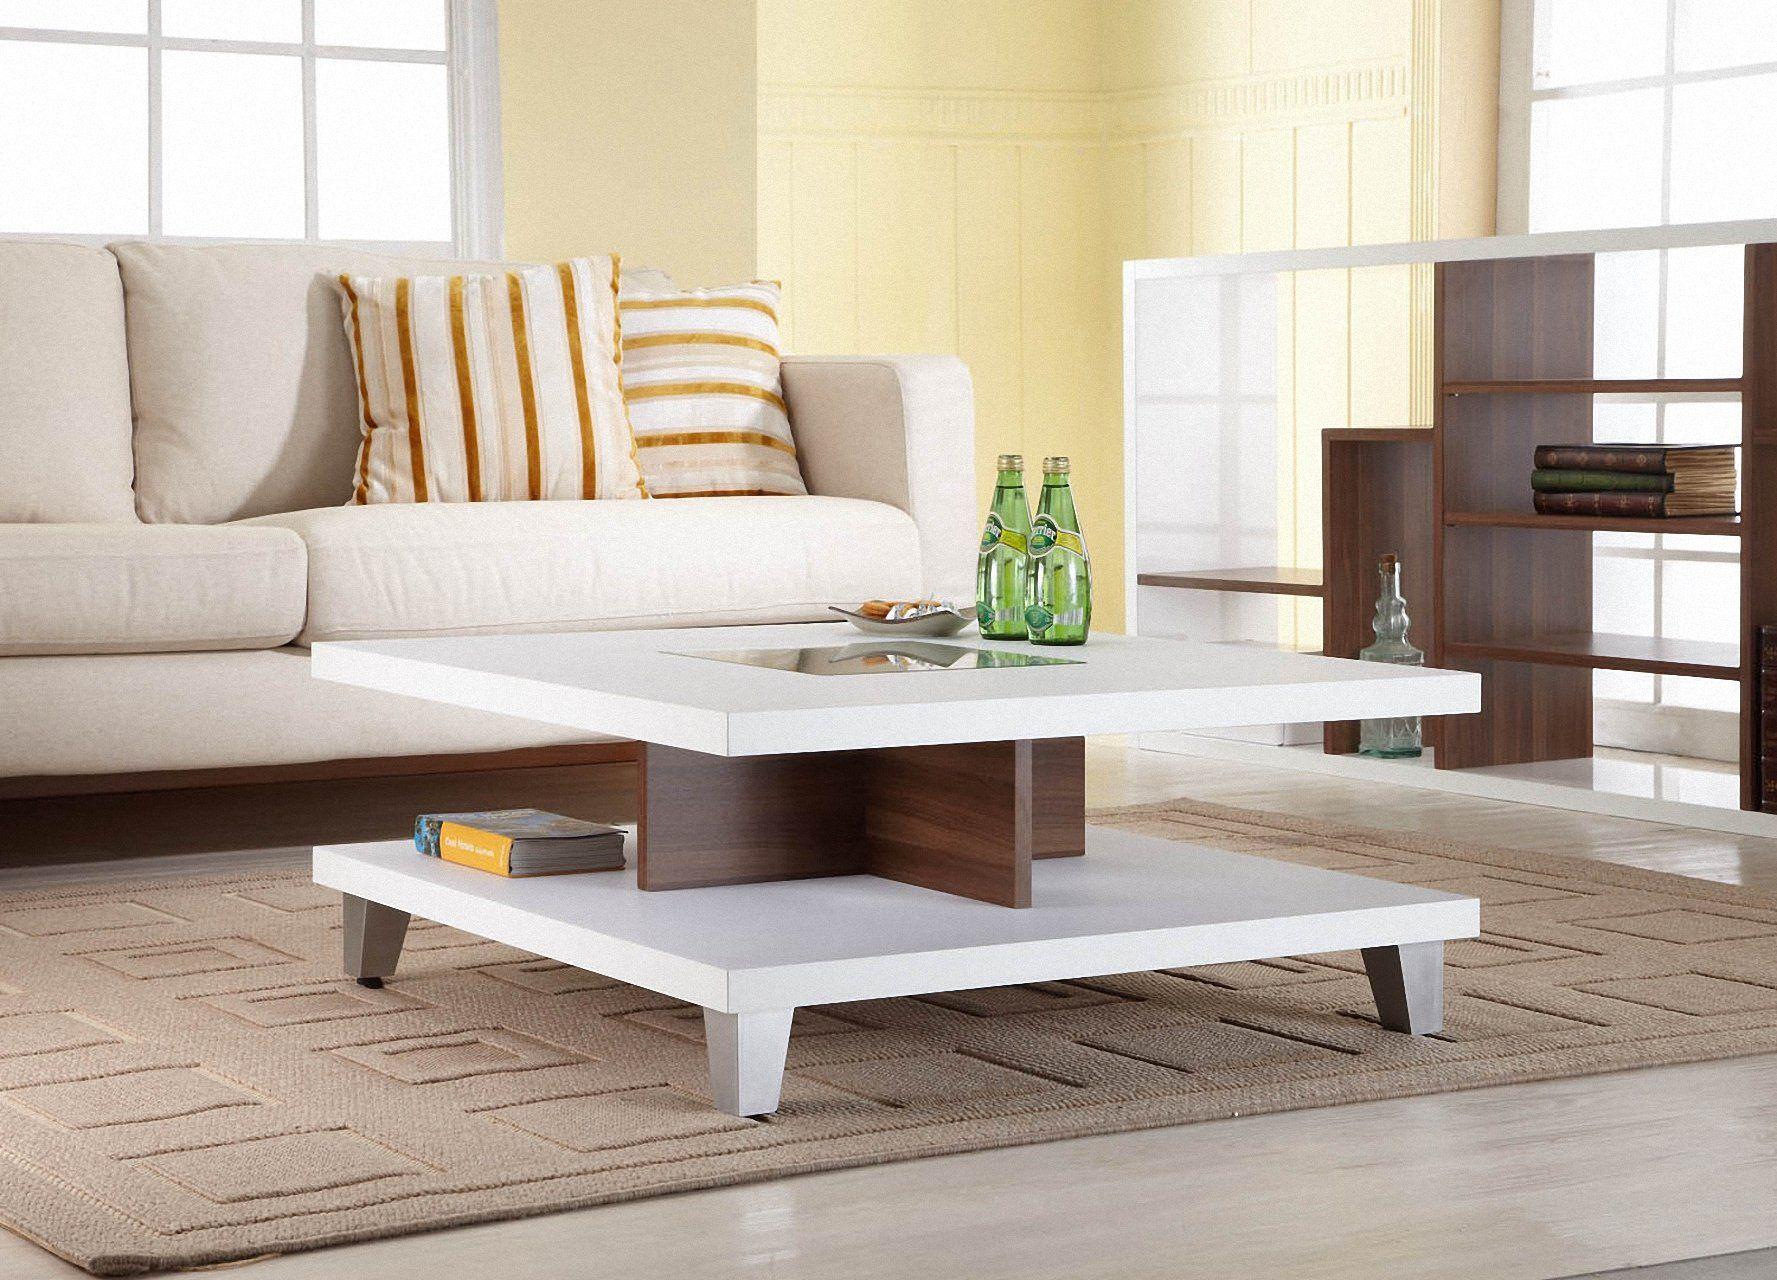 Amazon Com Enitial Lab Lendon Square Coffee Table White Coat